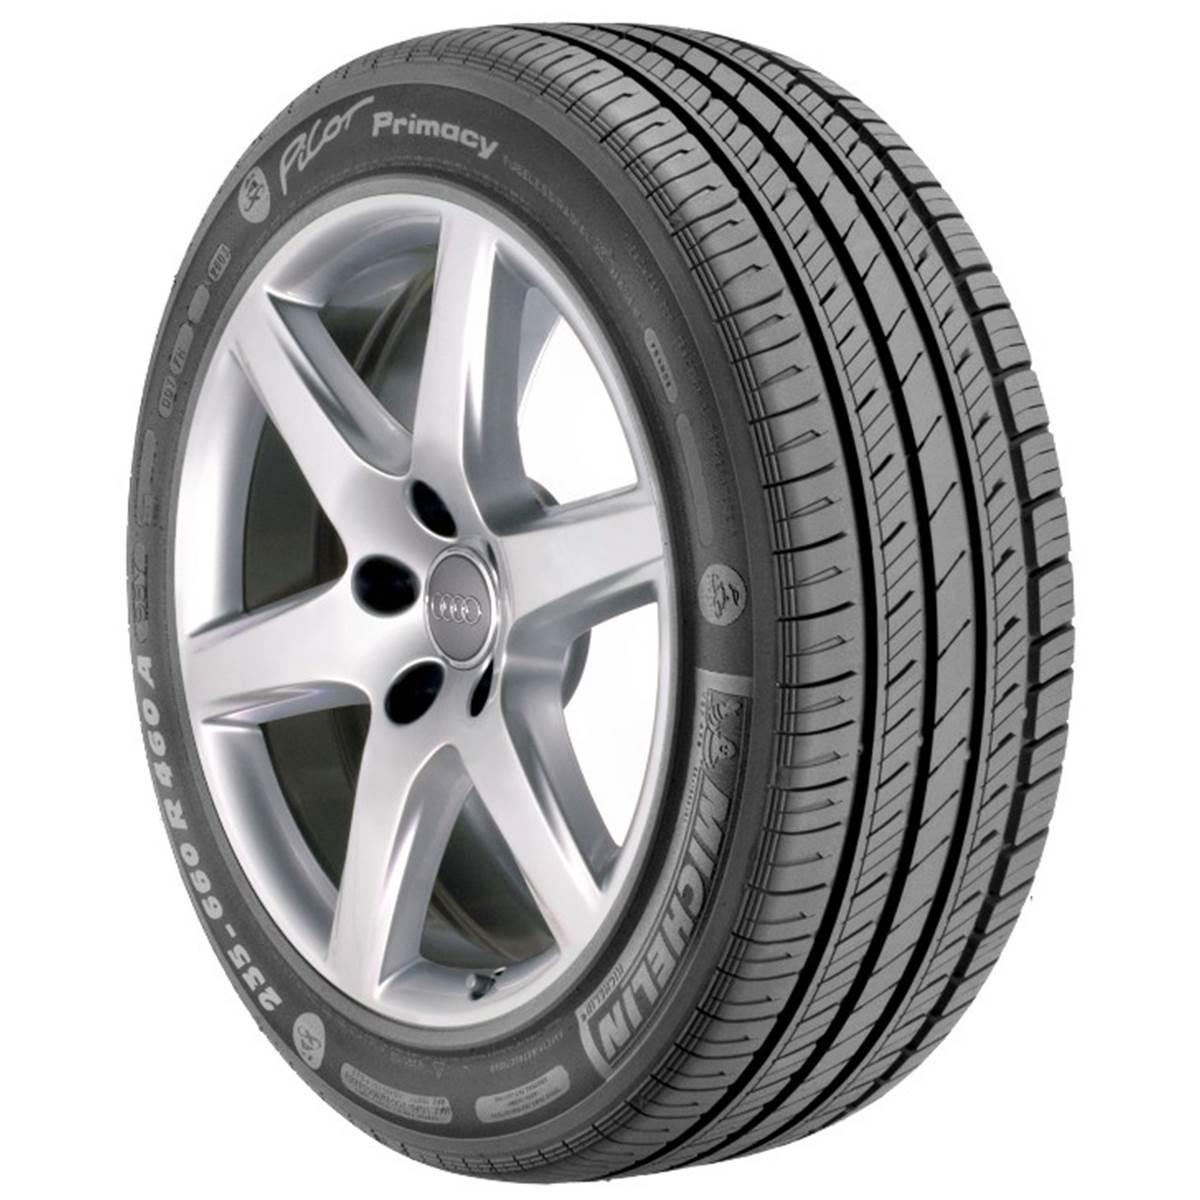 Pneu Michelin 275/35R20 98Y Pilot Primacy